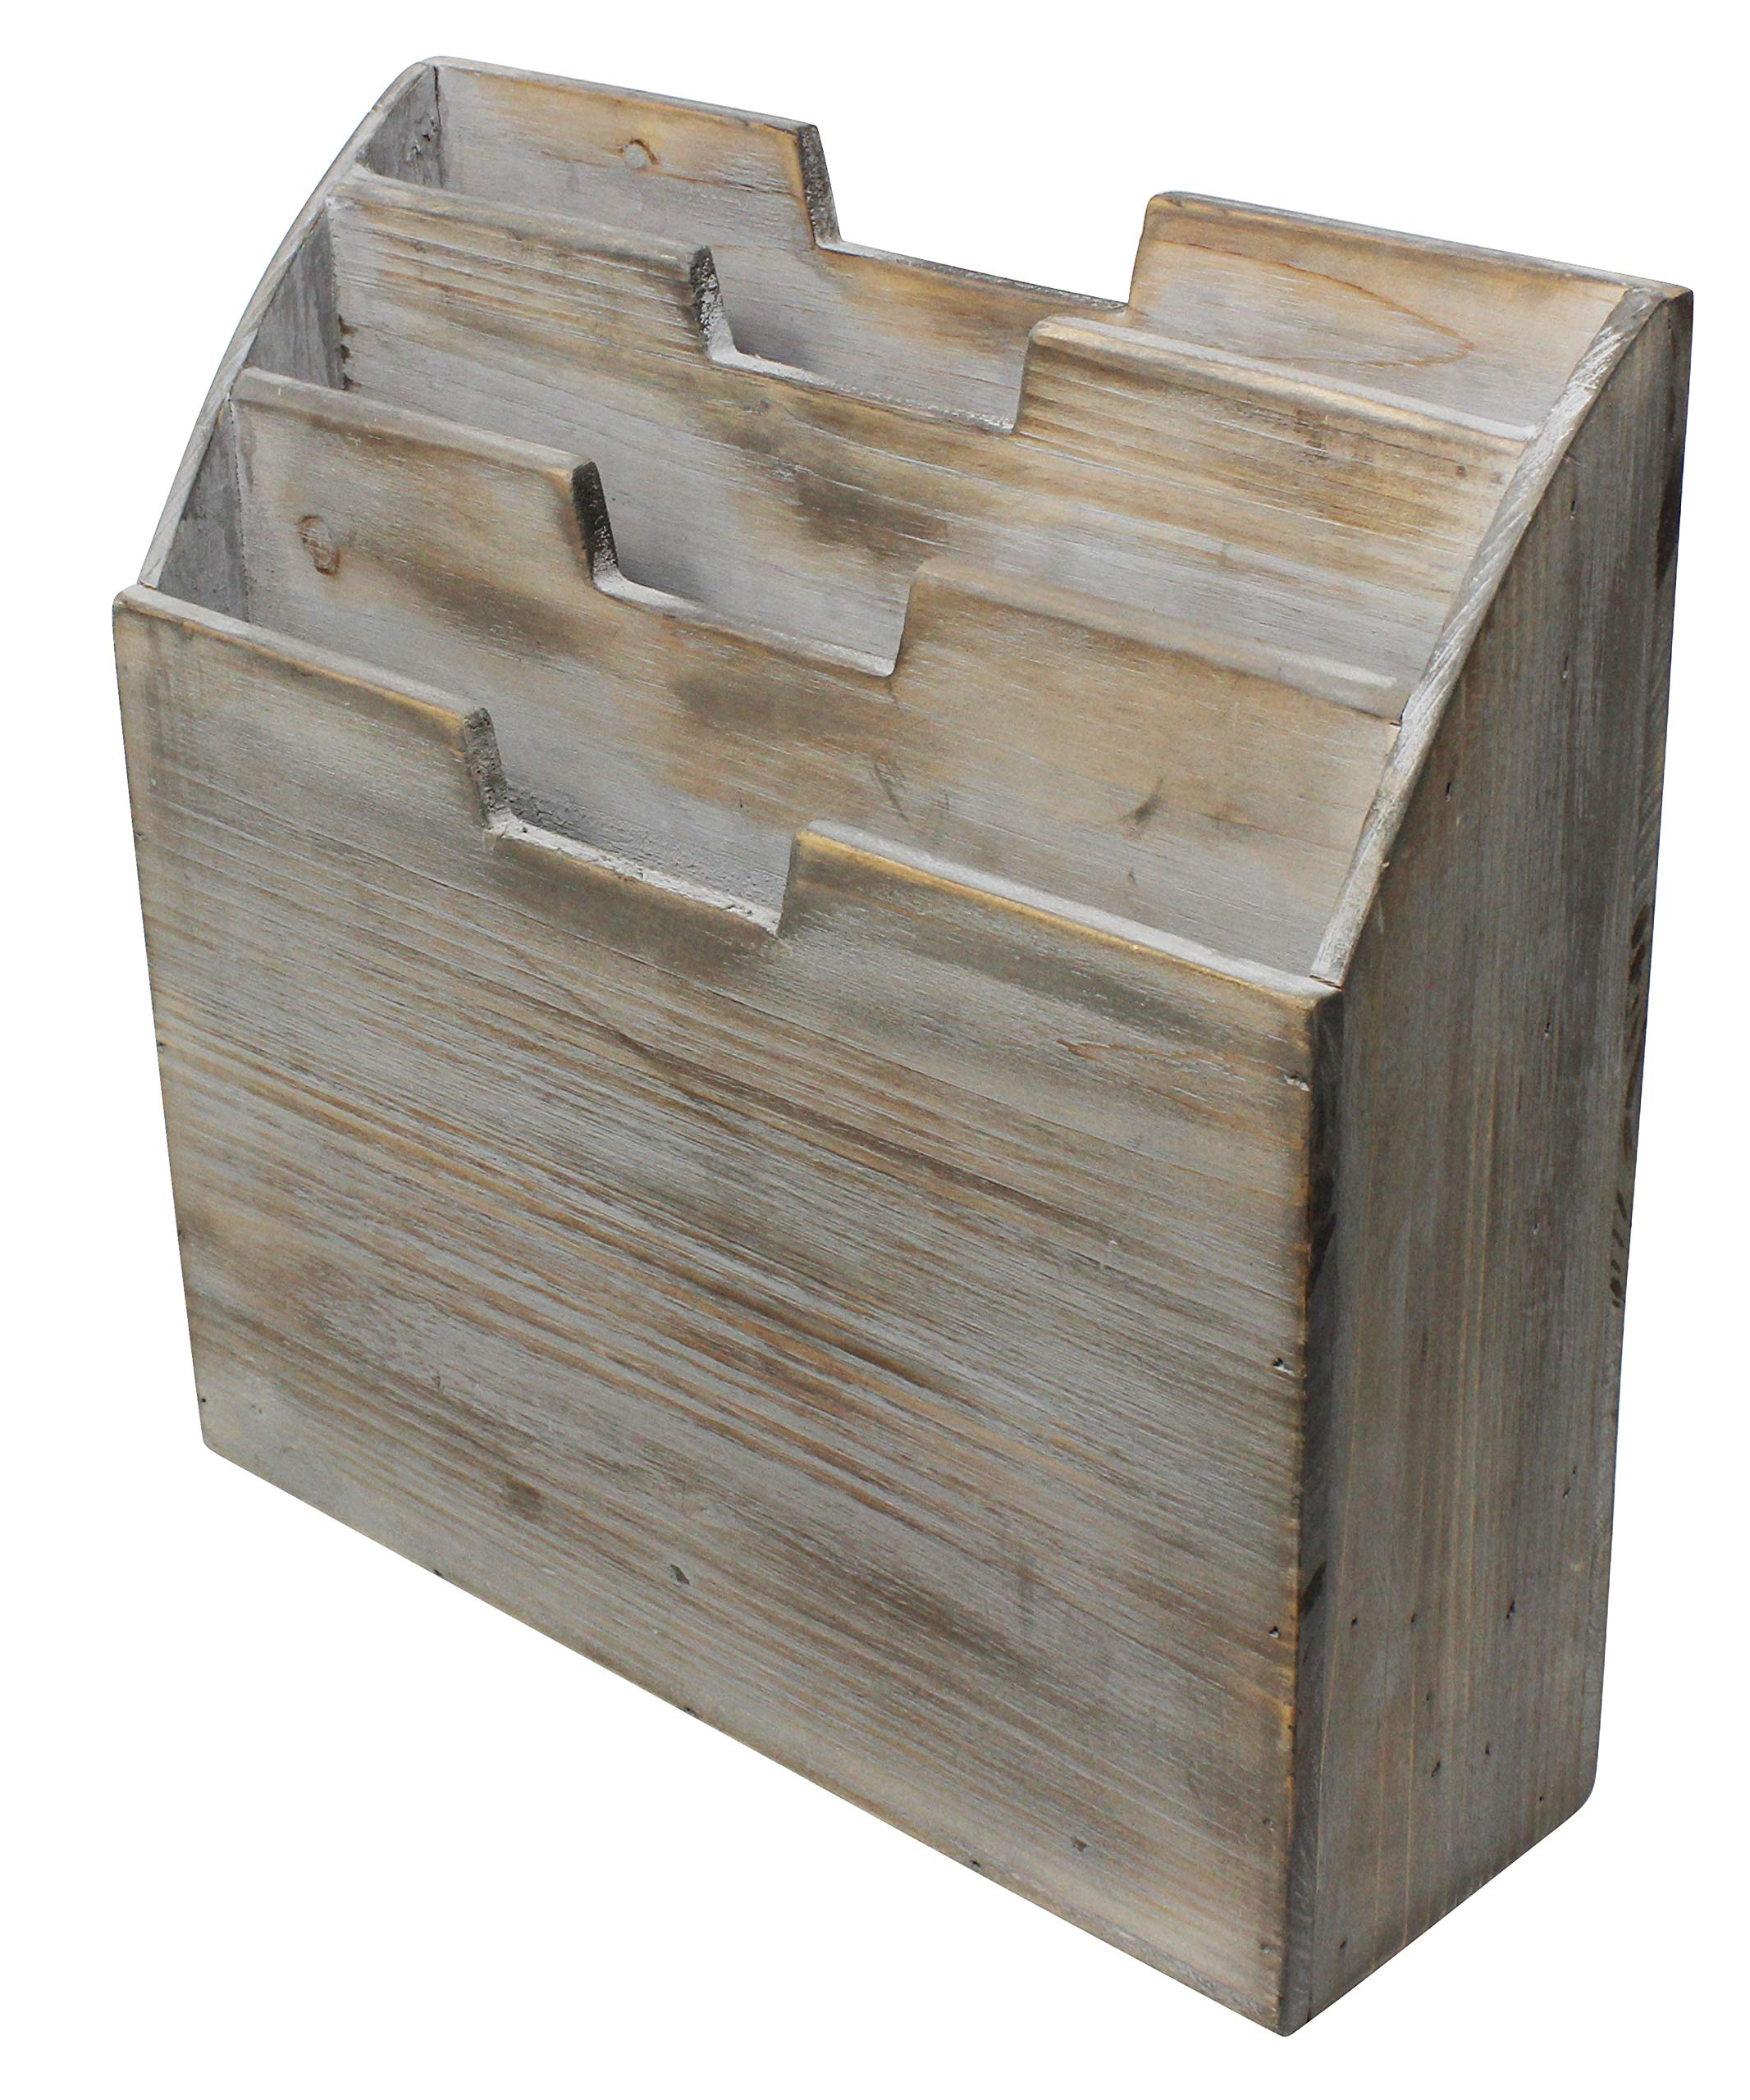 Vintage Rustic Wooden Office Desk Organizer & Vertical Paper File Holder For Desktop, Tabletop, or Counter - Distressed Torched Wood – For Mail, Envelopes, Mailing Supplies, Magazines, or File Folders